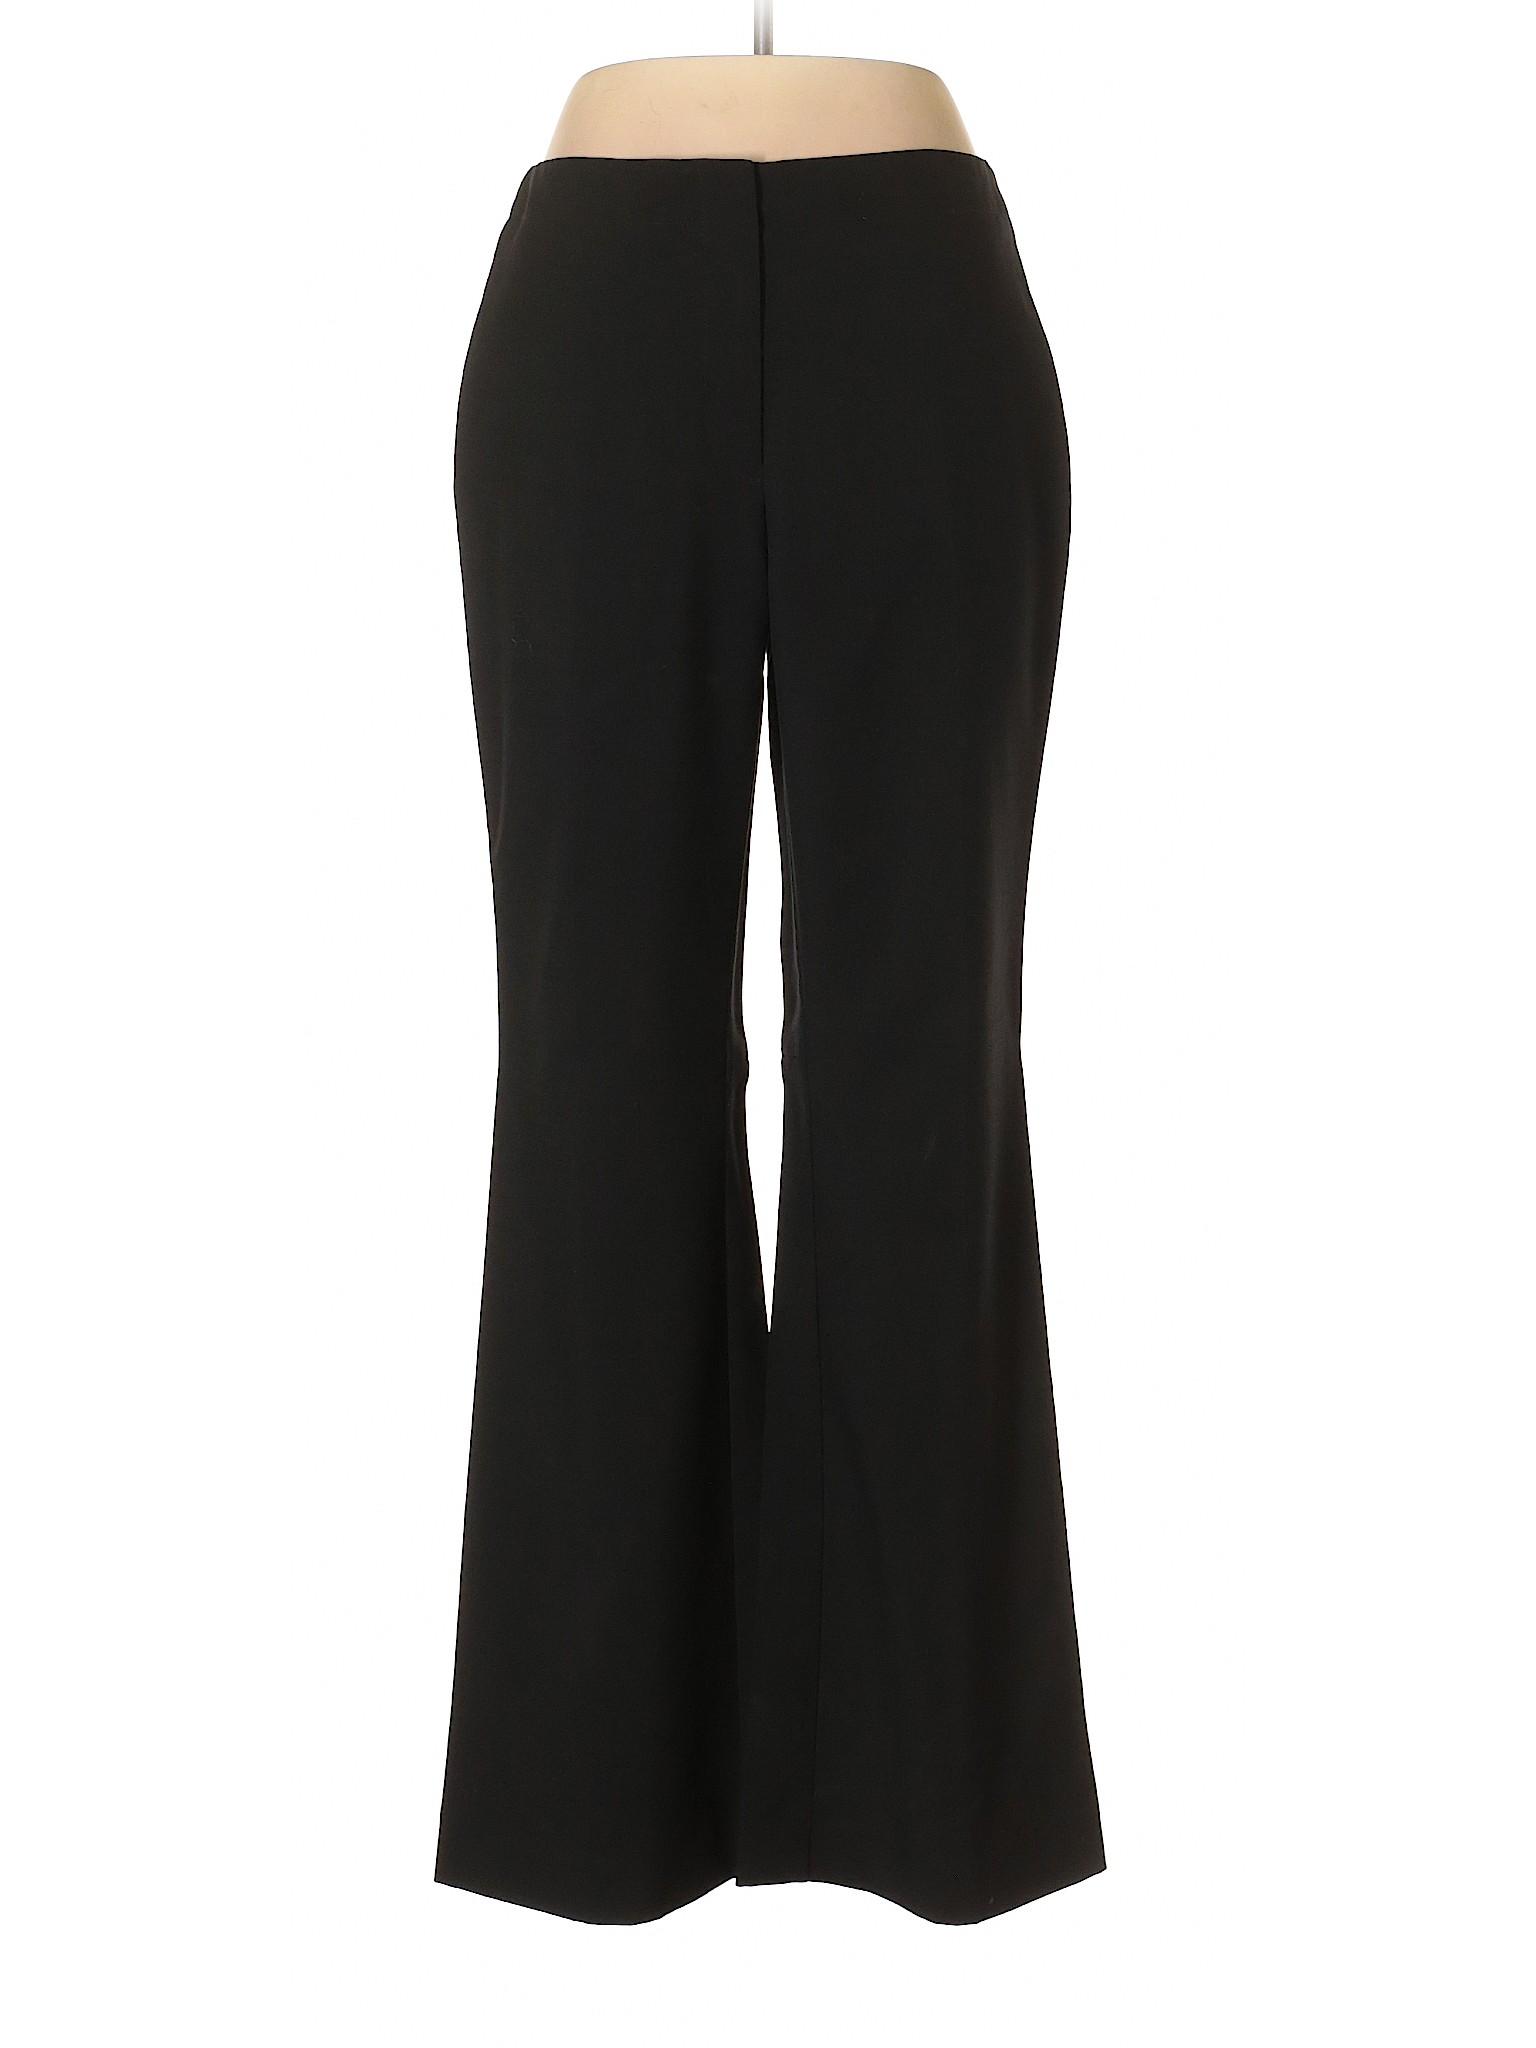 Leisure Pants amp; Company New Dress York winter rPAB4wqr